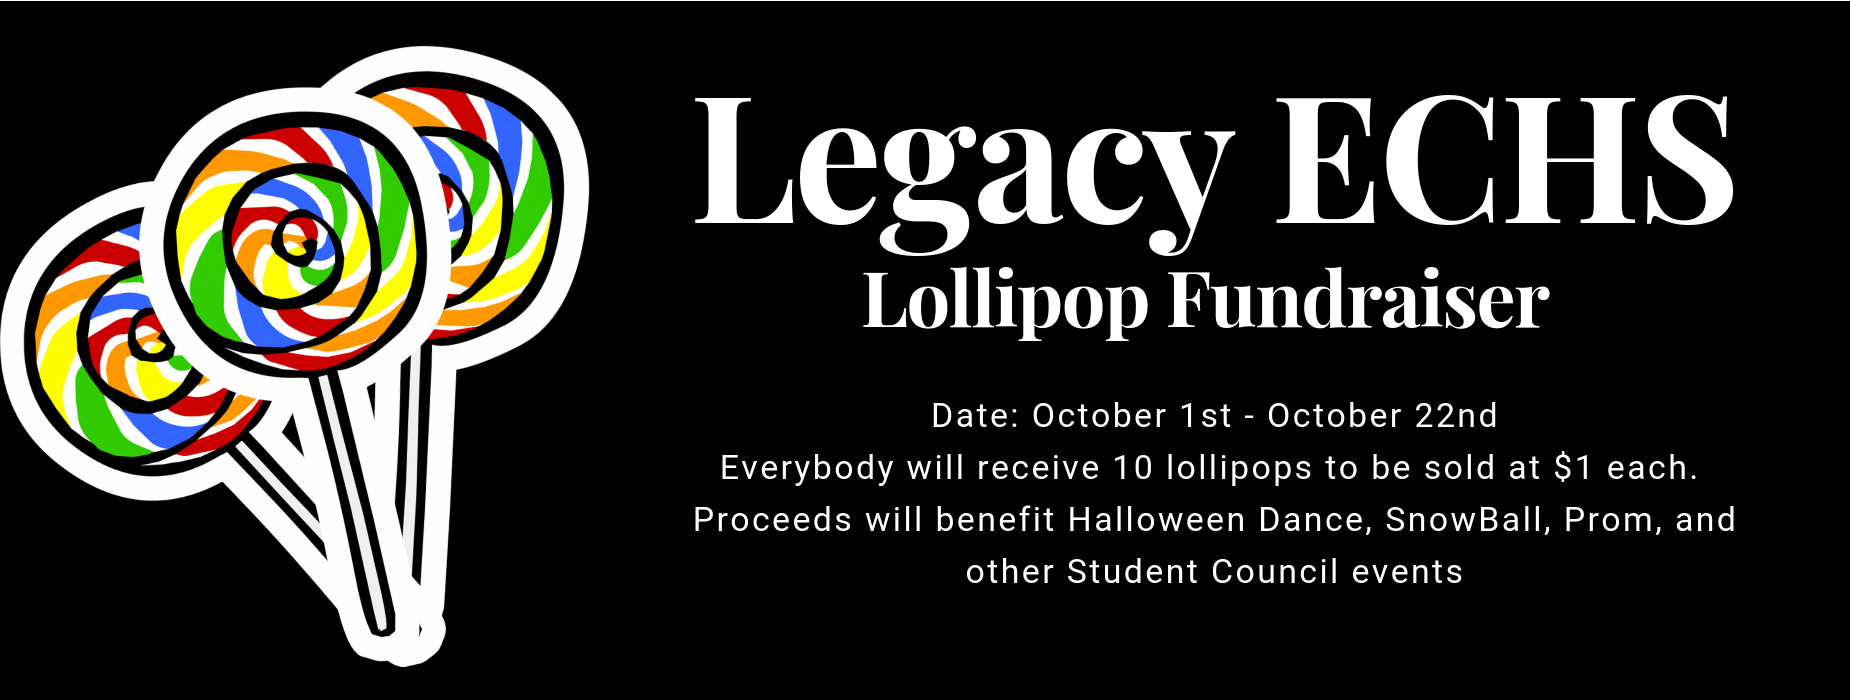 StuCo Lollipop Fundraiser 10/1-10/22